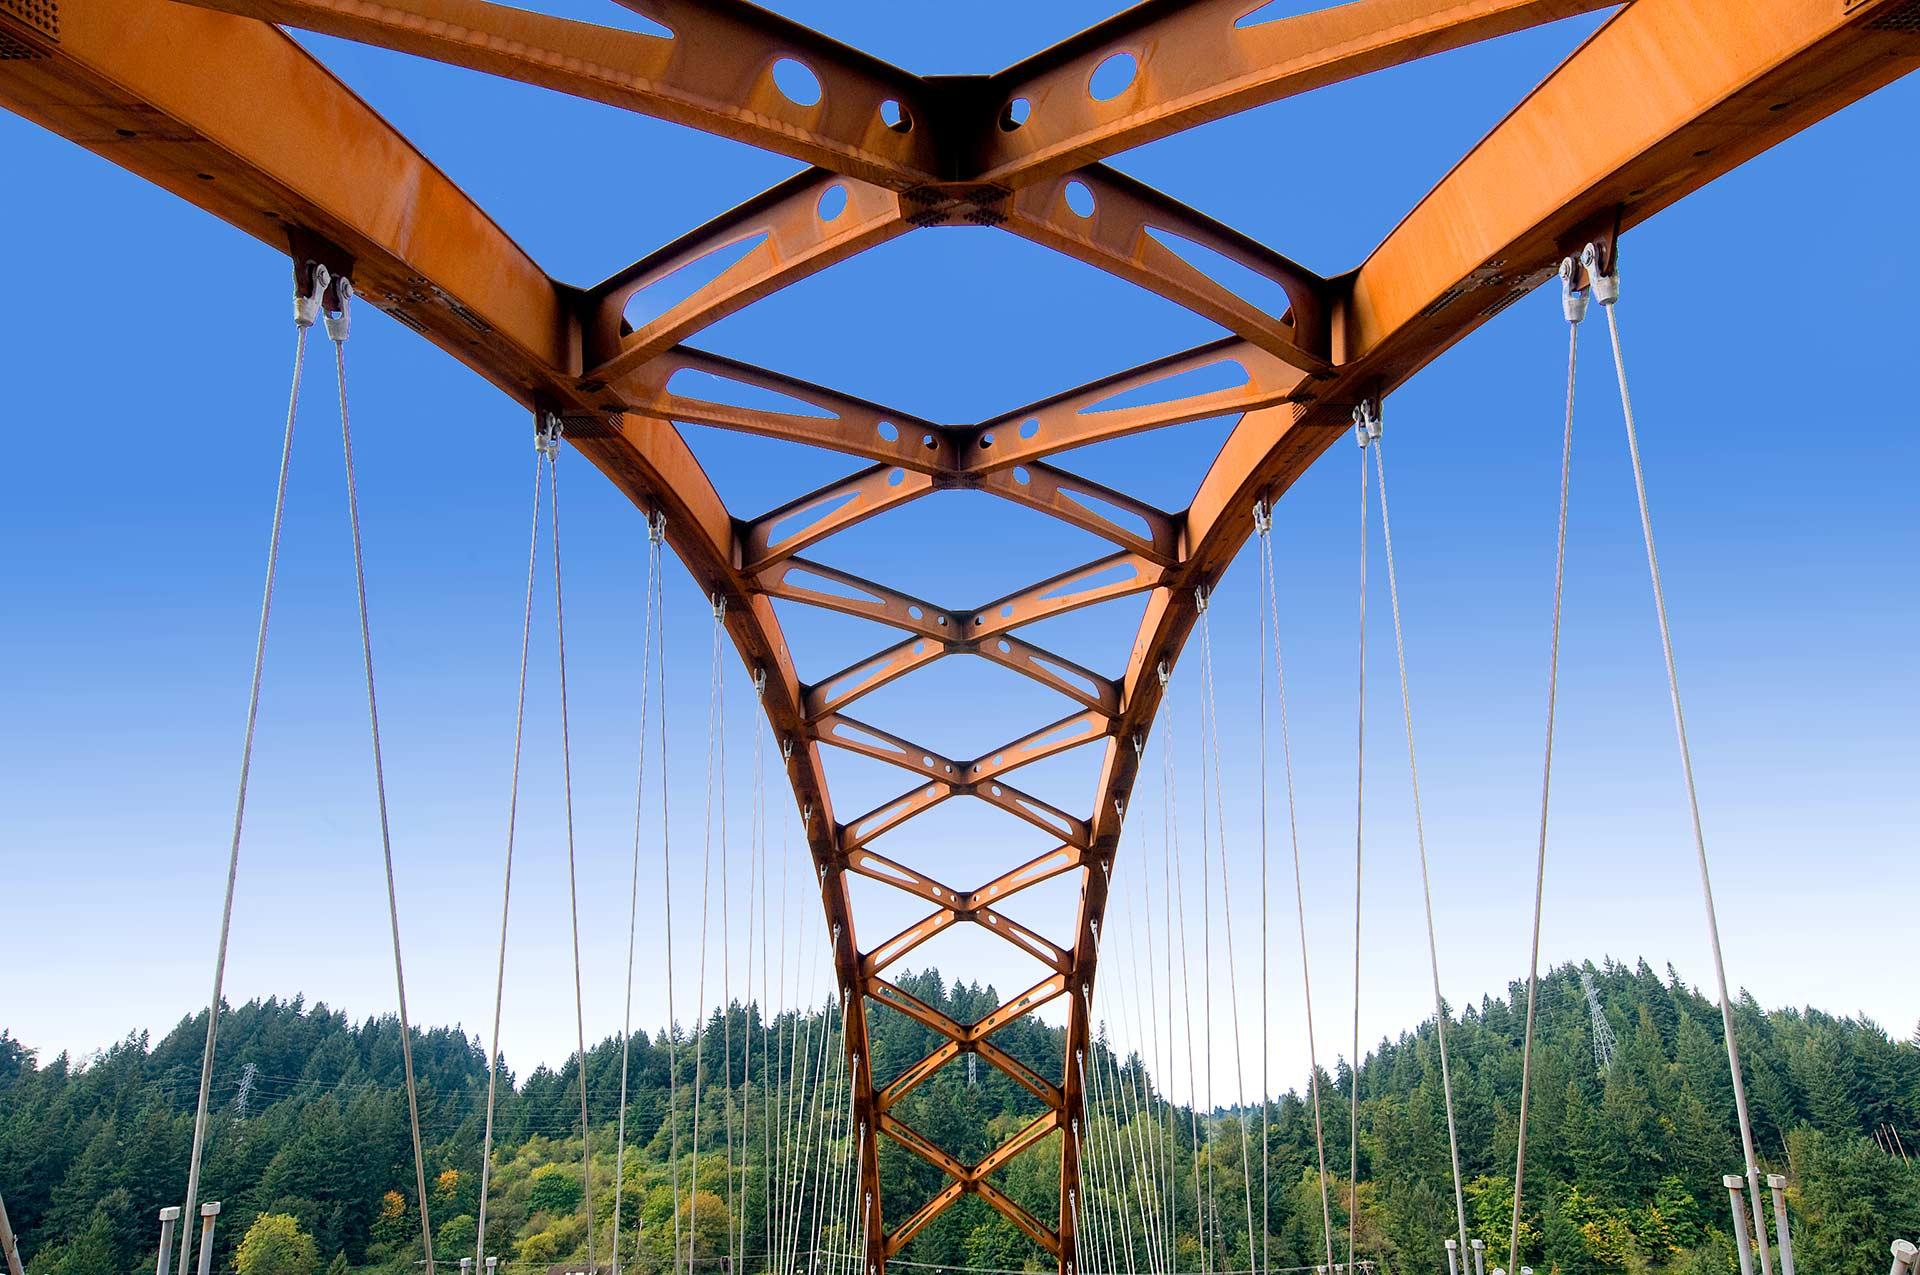 Sauvie-bridge-architectural-photographer-portland-oregon